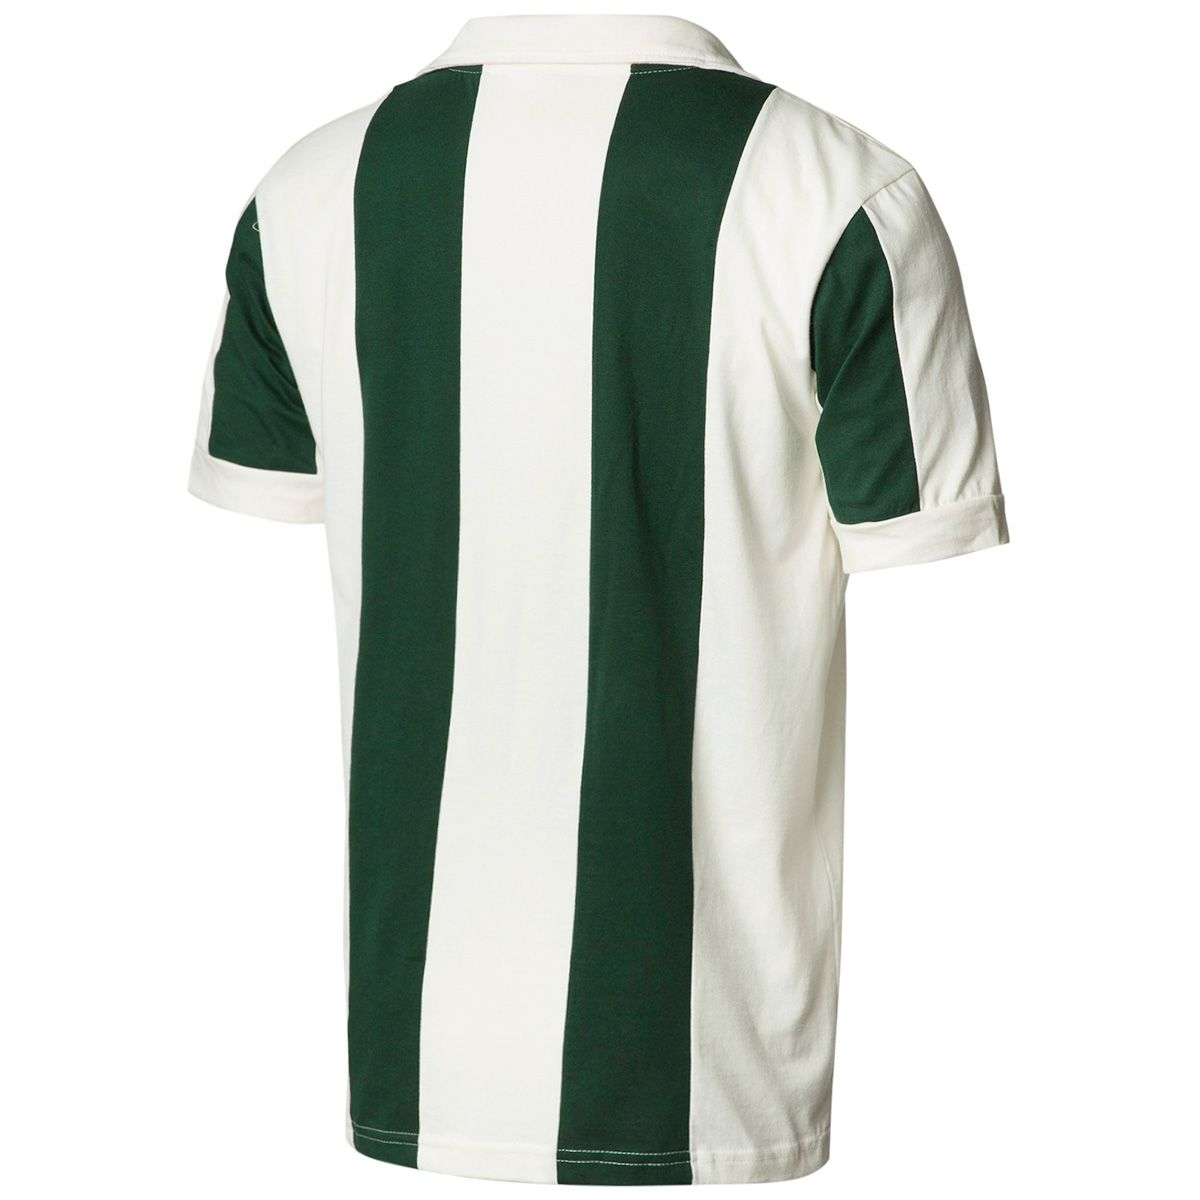 Camisa Polo Retrô Gol Chapecoense Listrada Torcedor